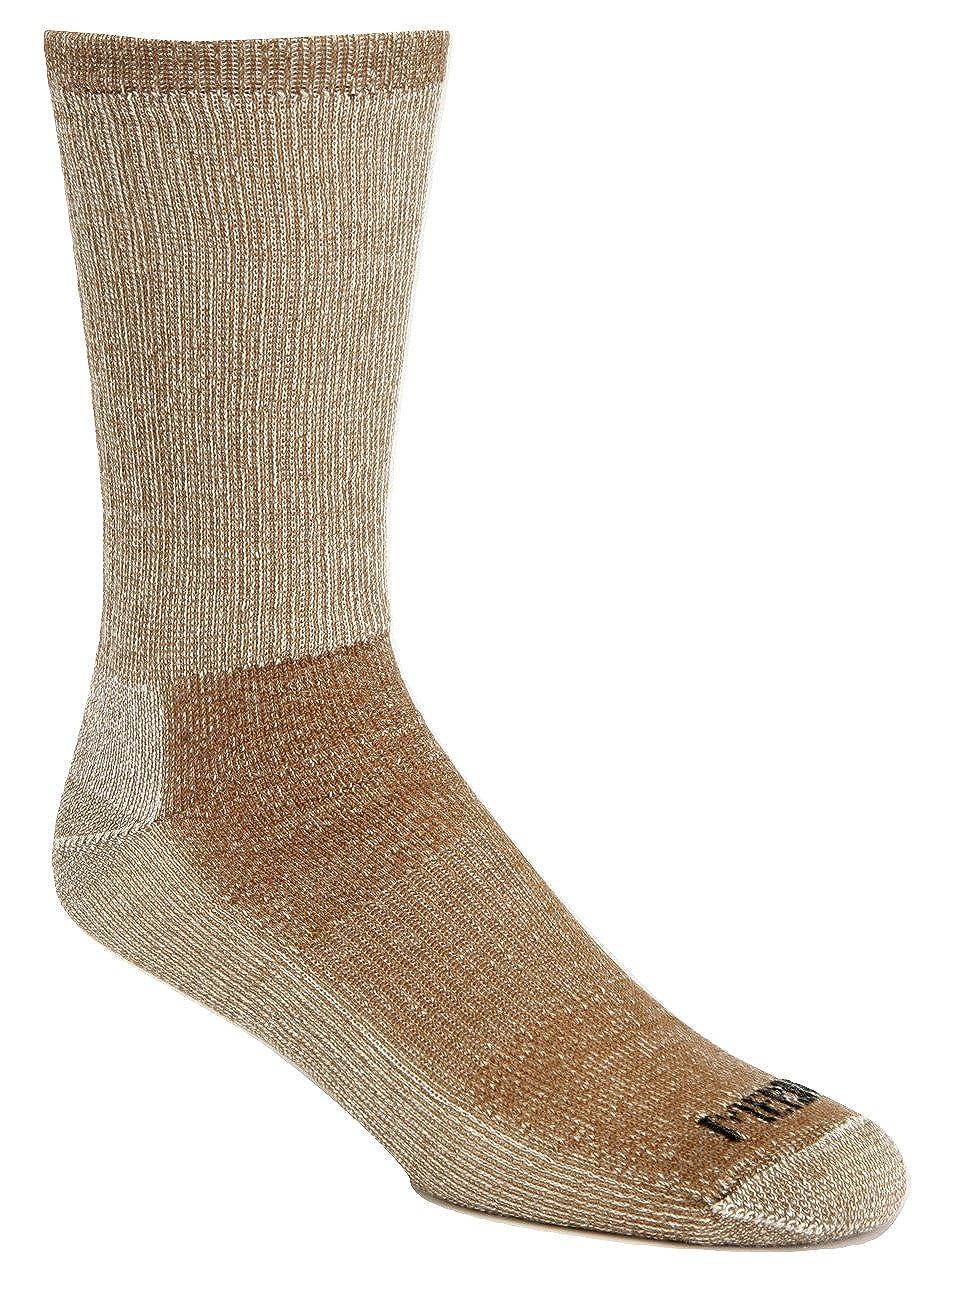 Super-wool Hiker GX Merino Wool Hiking Socks 3 Pairs